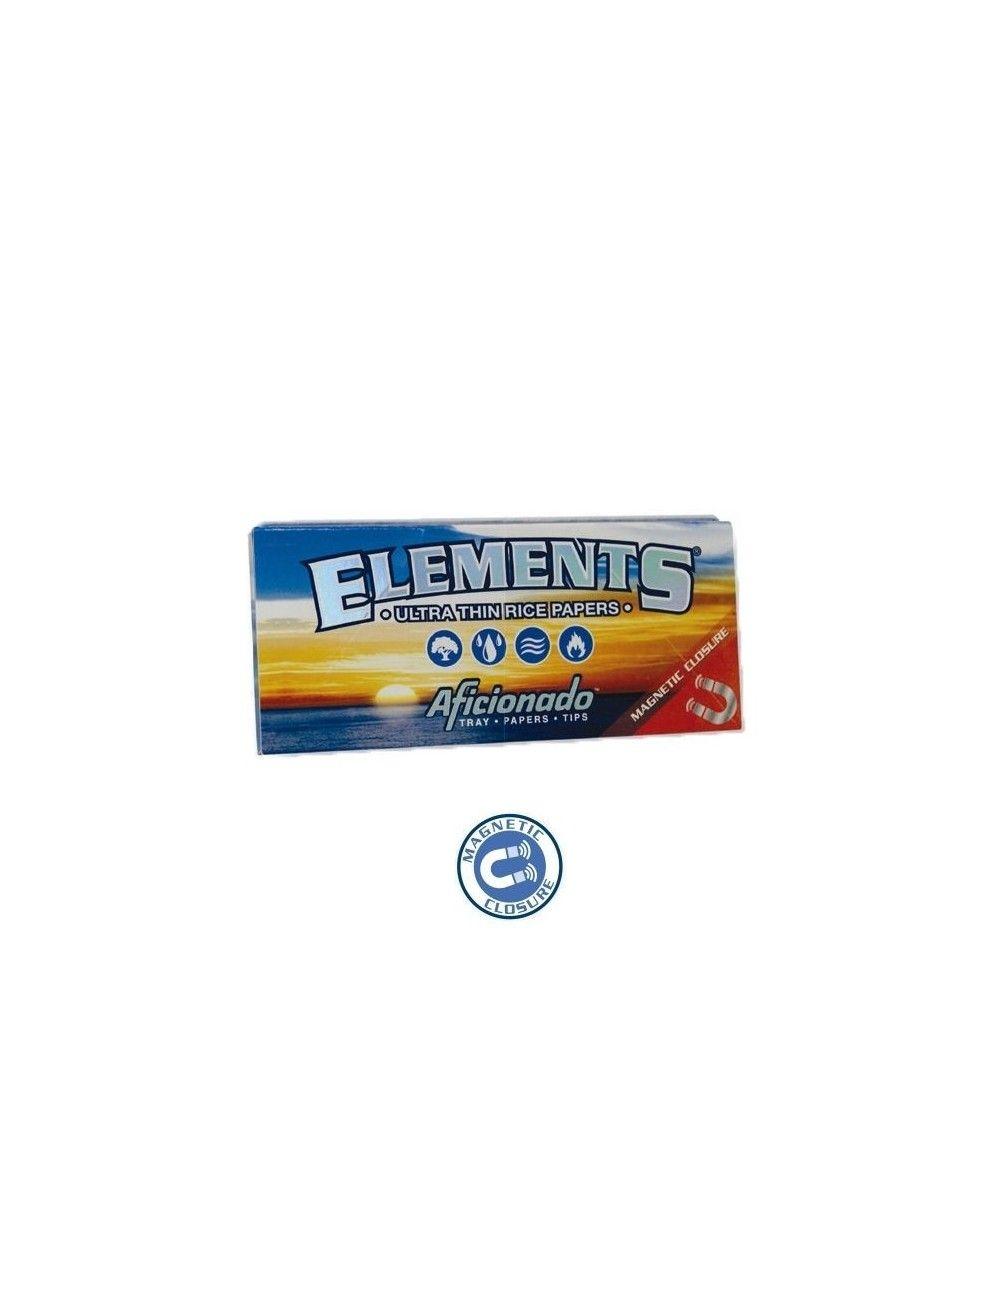 Elements Aficionado King Size